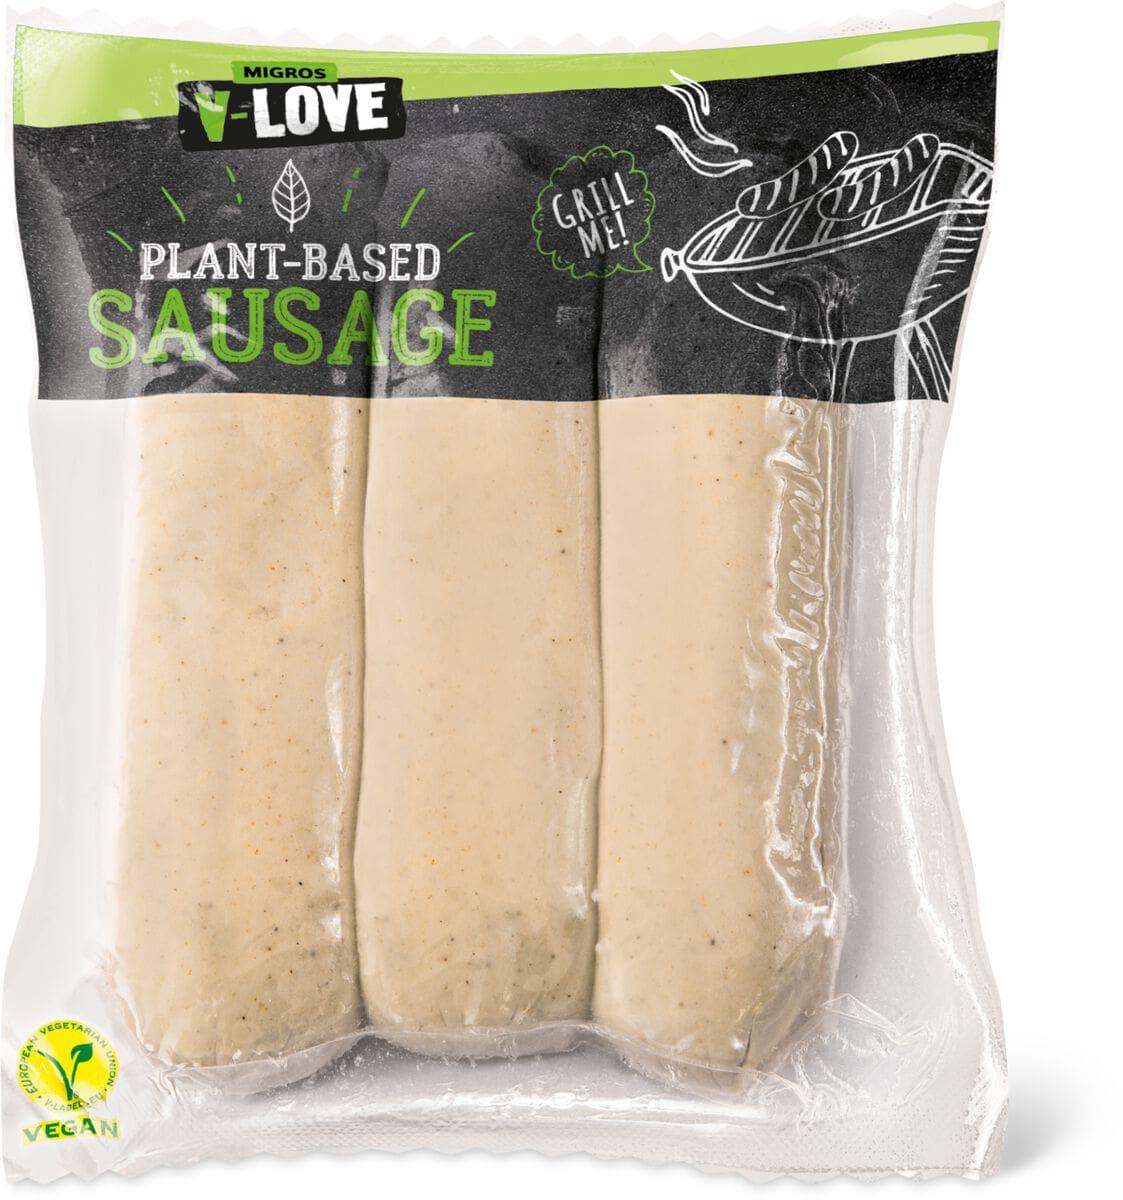 V-Love Plant-Based Bratwurst